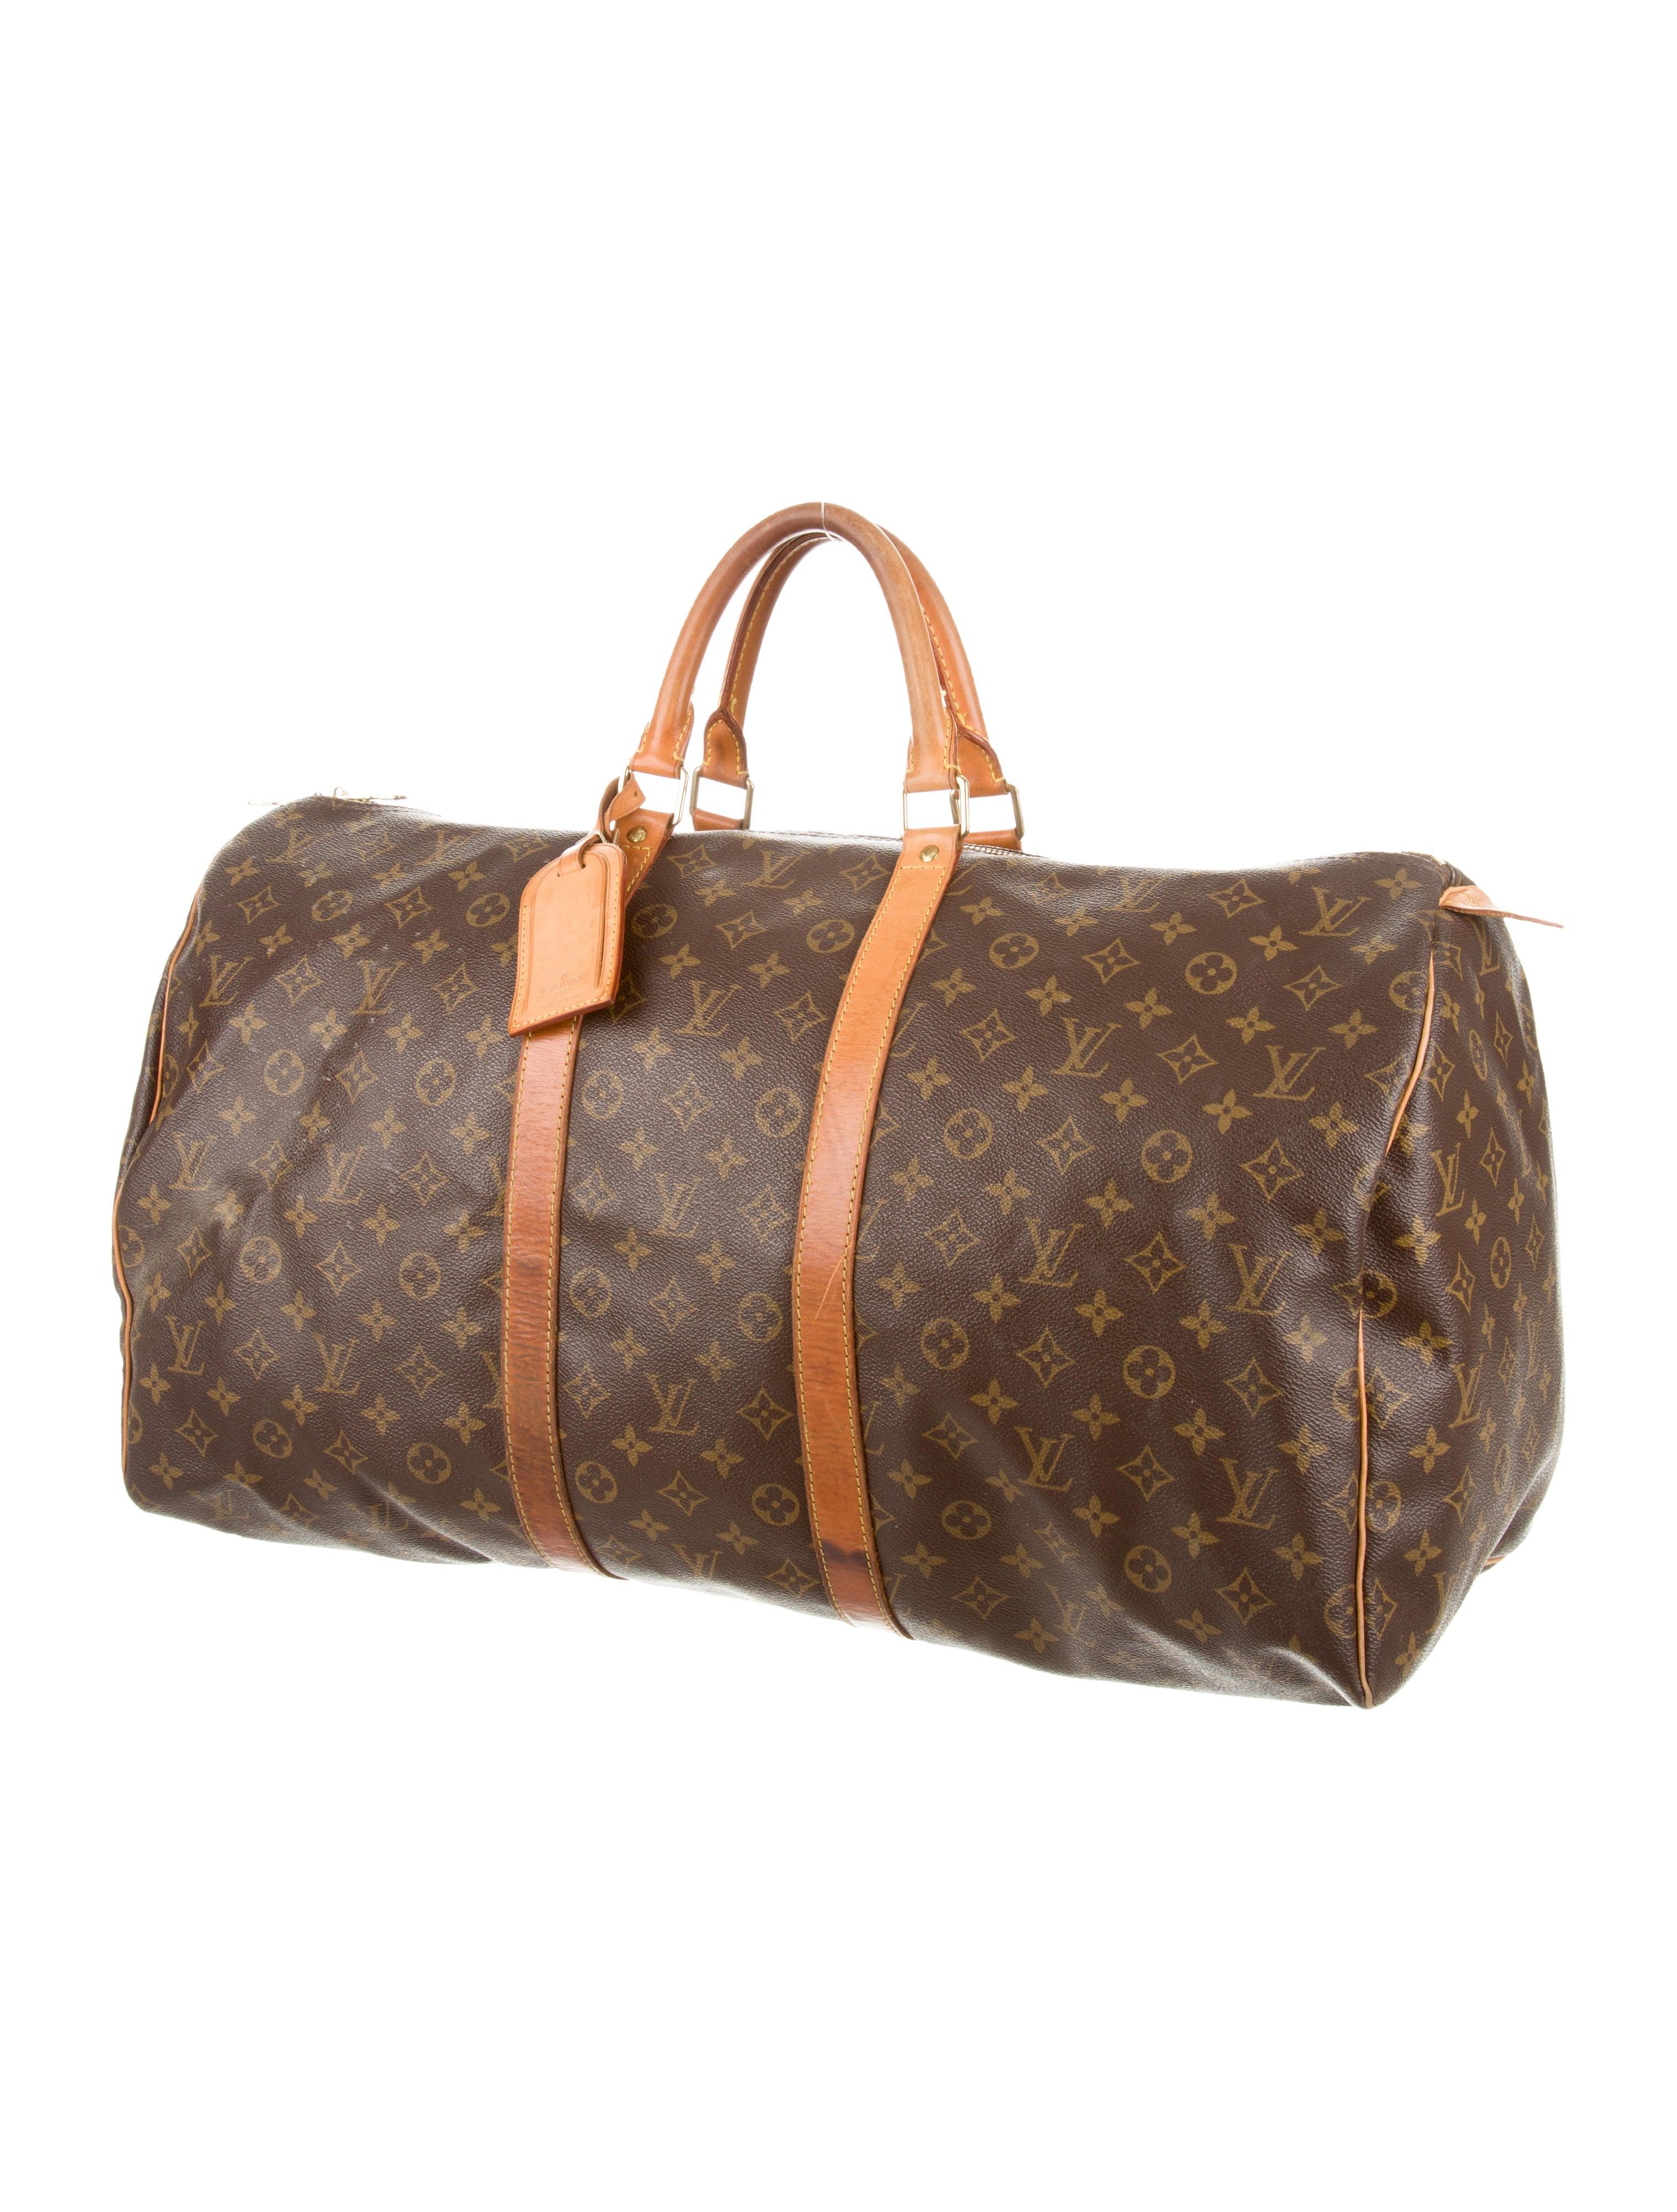 louis vuitton monogram keepall 55 handbags lou66441 the realreal. Black Bedroom Furniture Sets. Home Design Ideas